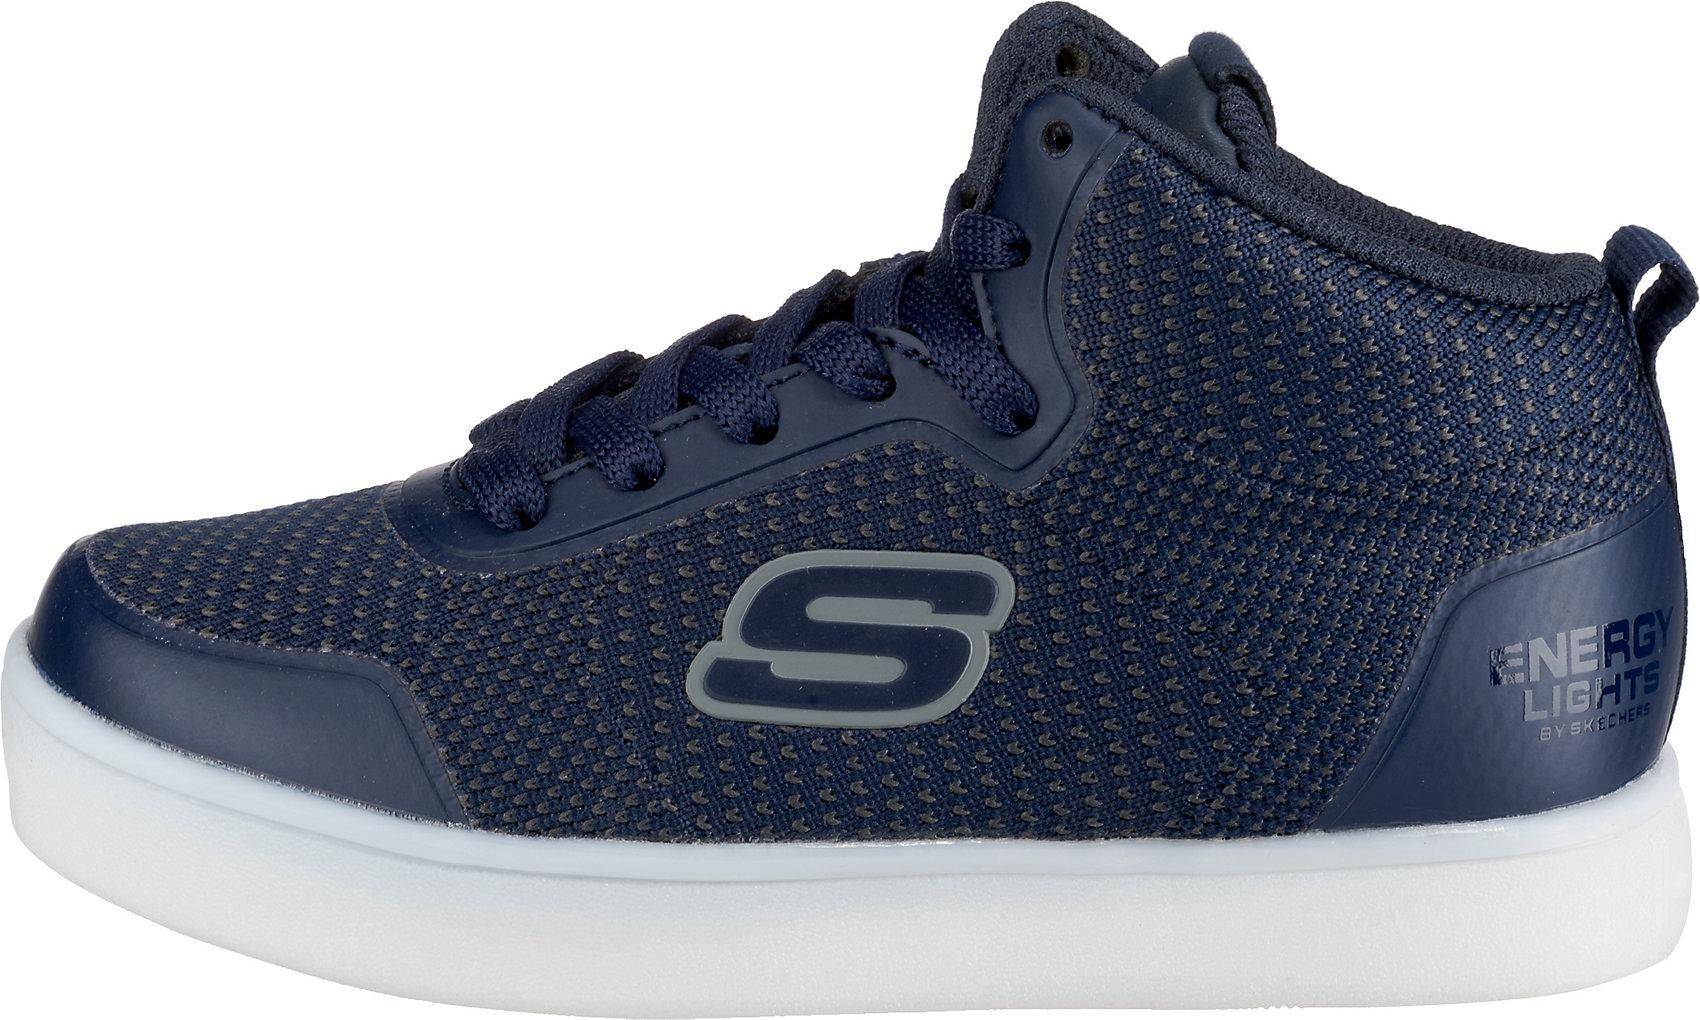 Details zu Neu SKECHERS Kinder Sneakers High Blinkies ENERGY LIGHTS HALATION 10321760